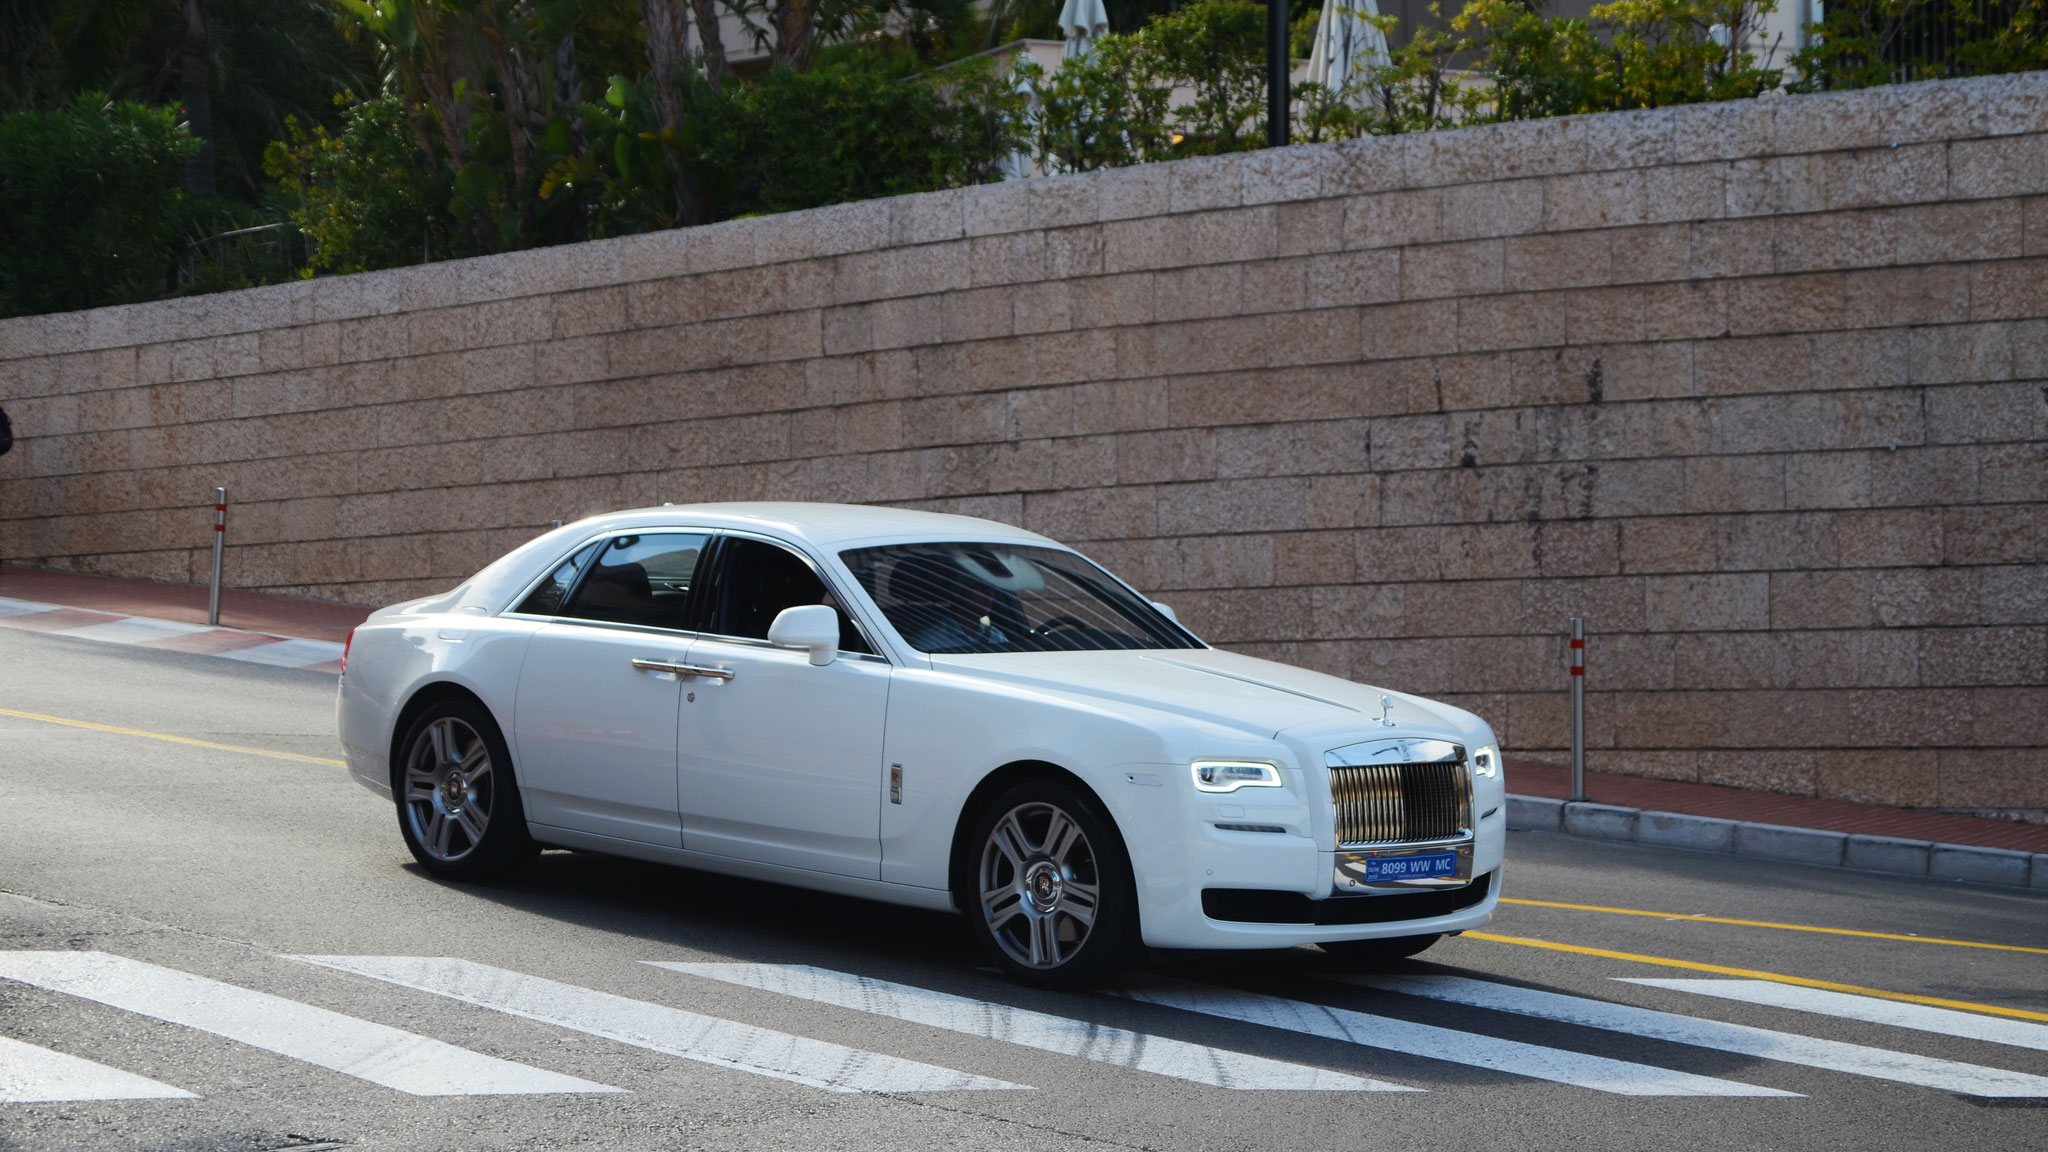 Rolls Royce Ghost Series II - 8099-WW-MC (MC)